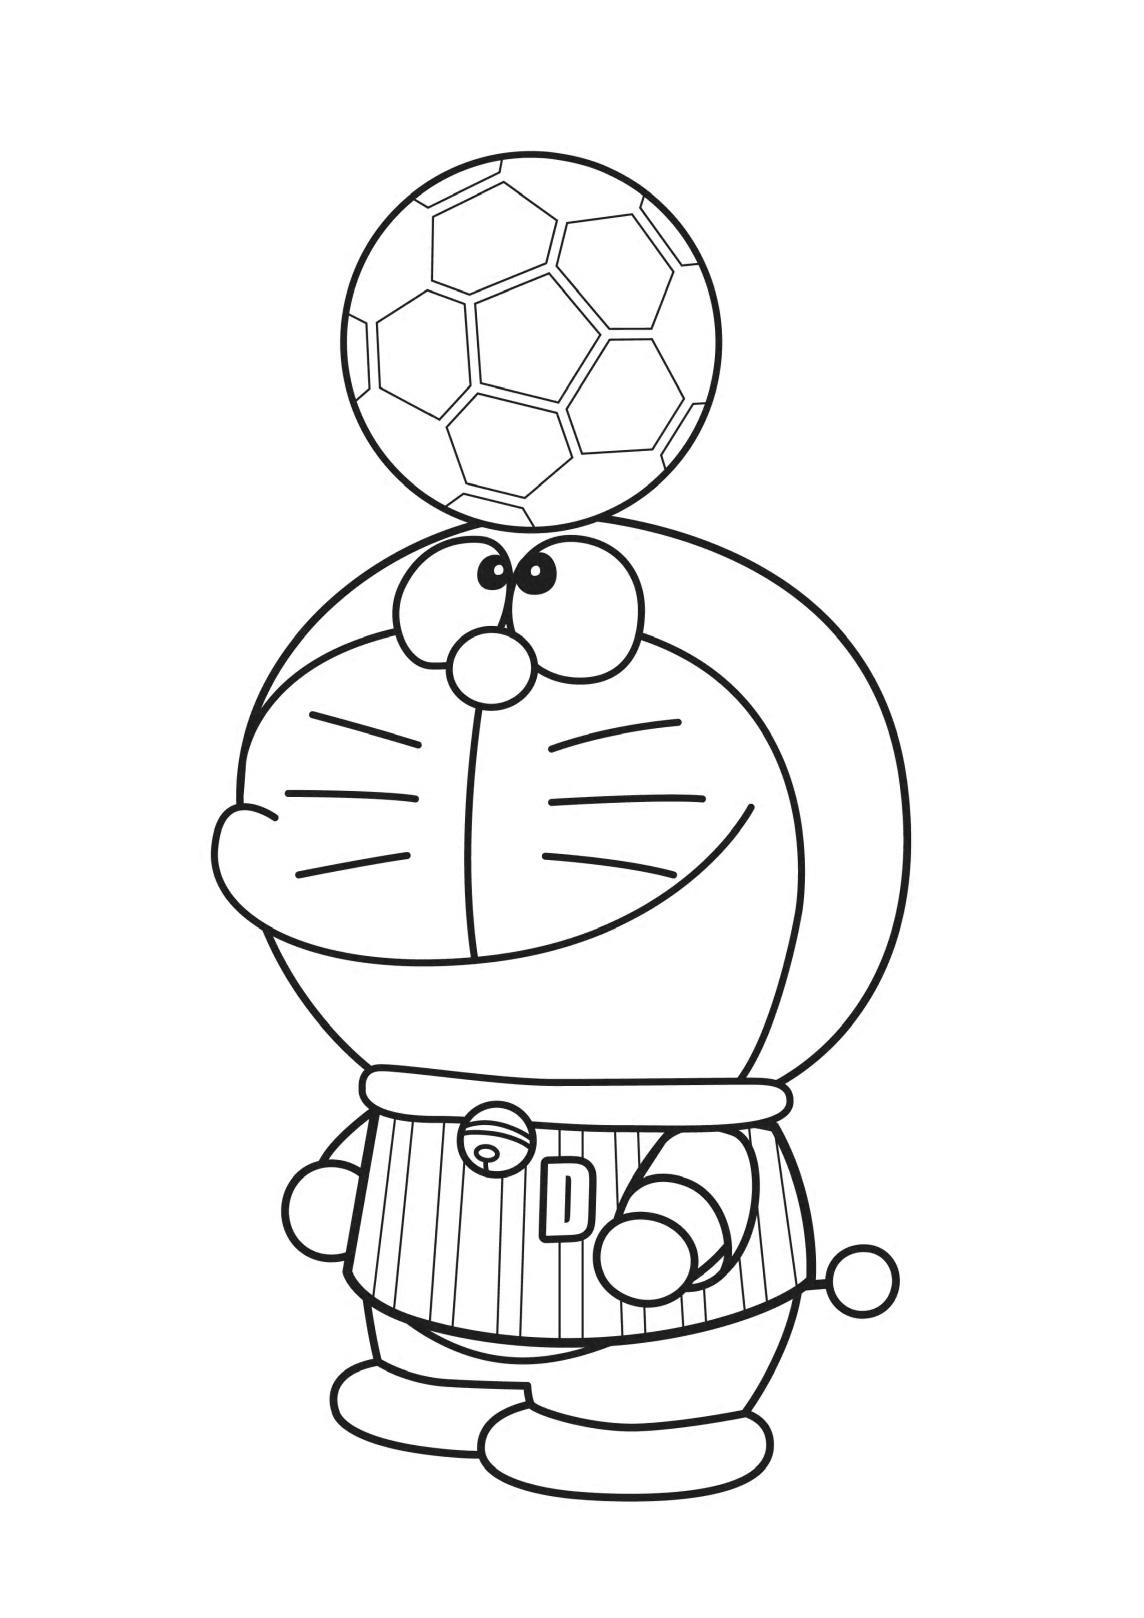 Doraemon Playing Soccer